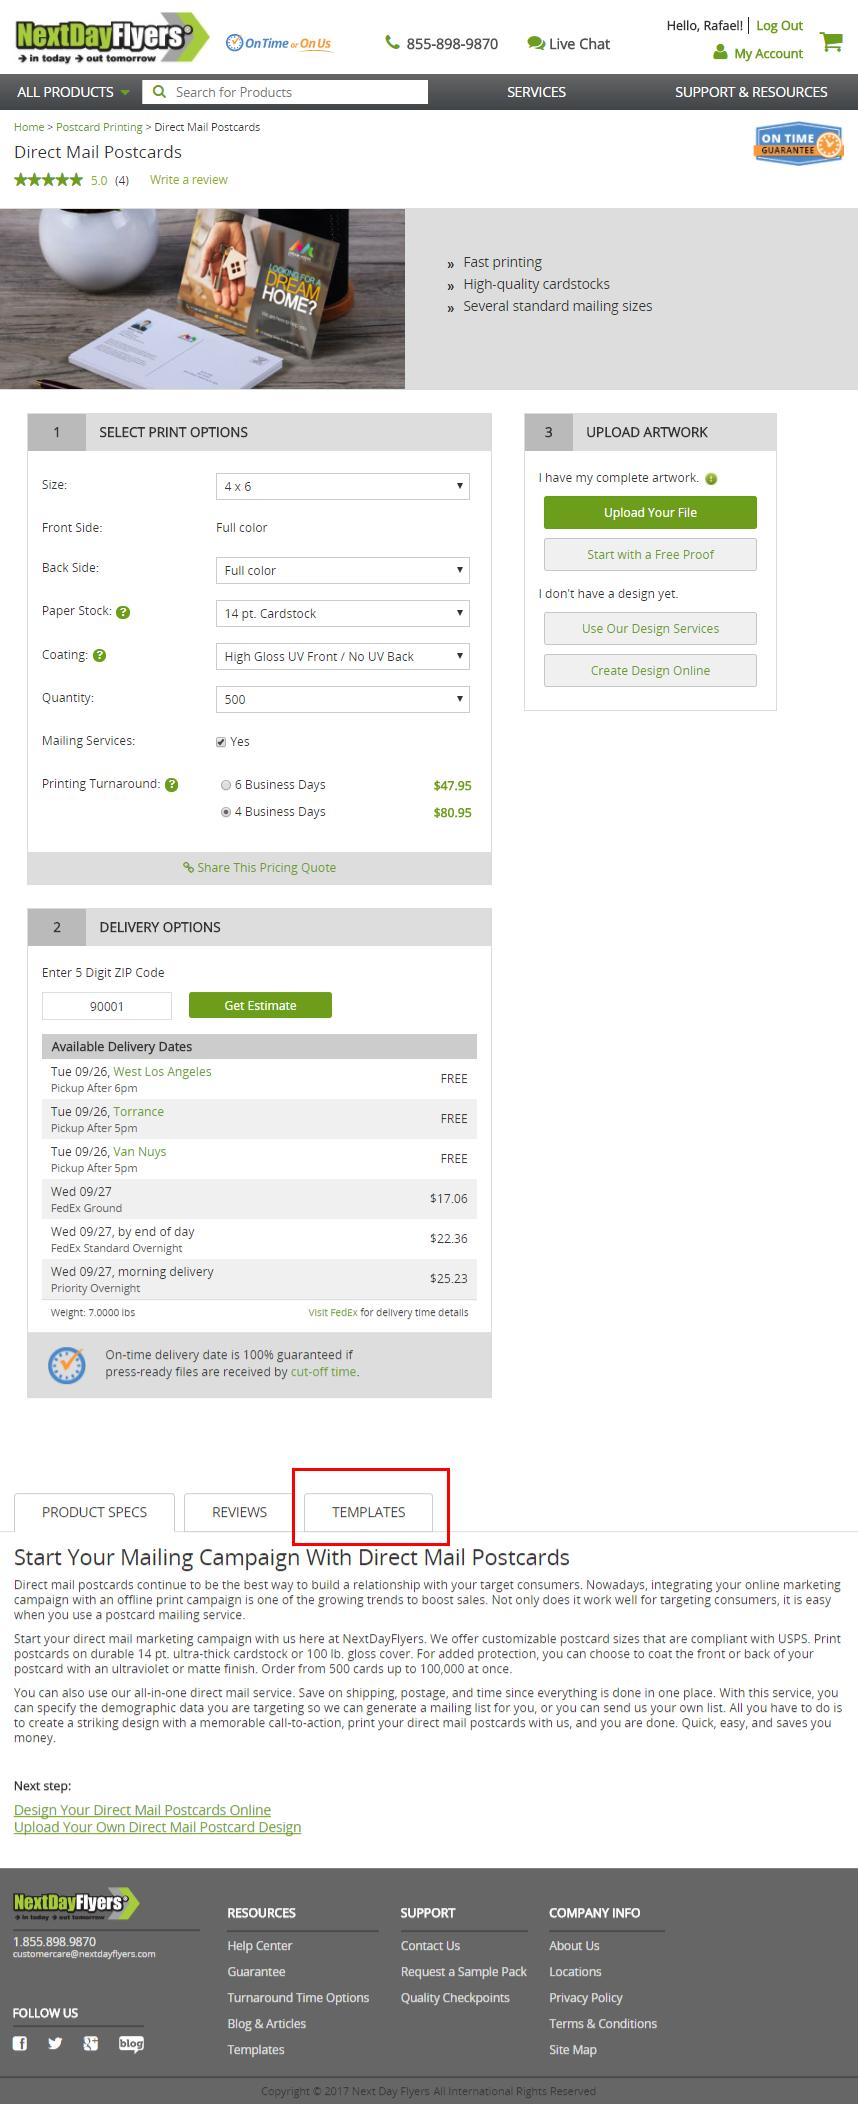 NextDayFlyers mailing templates